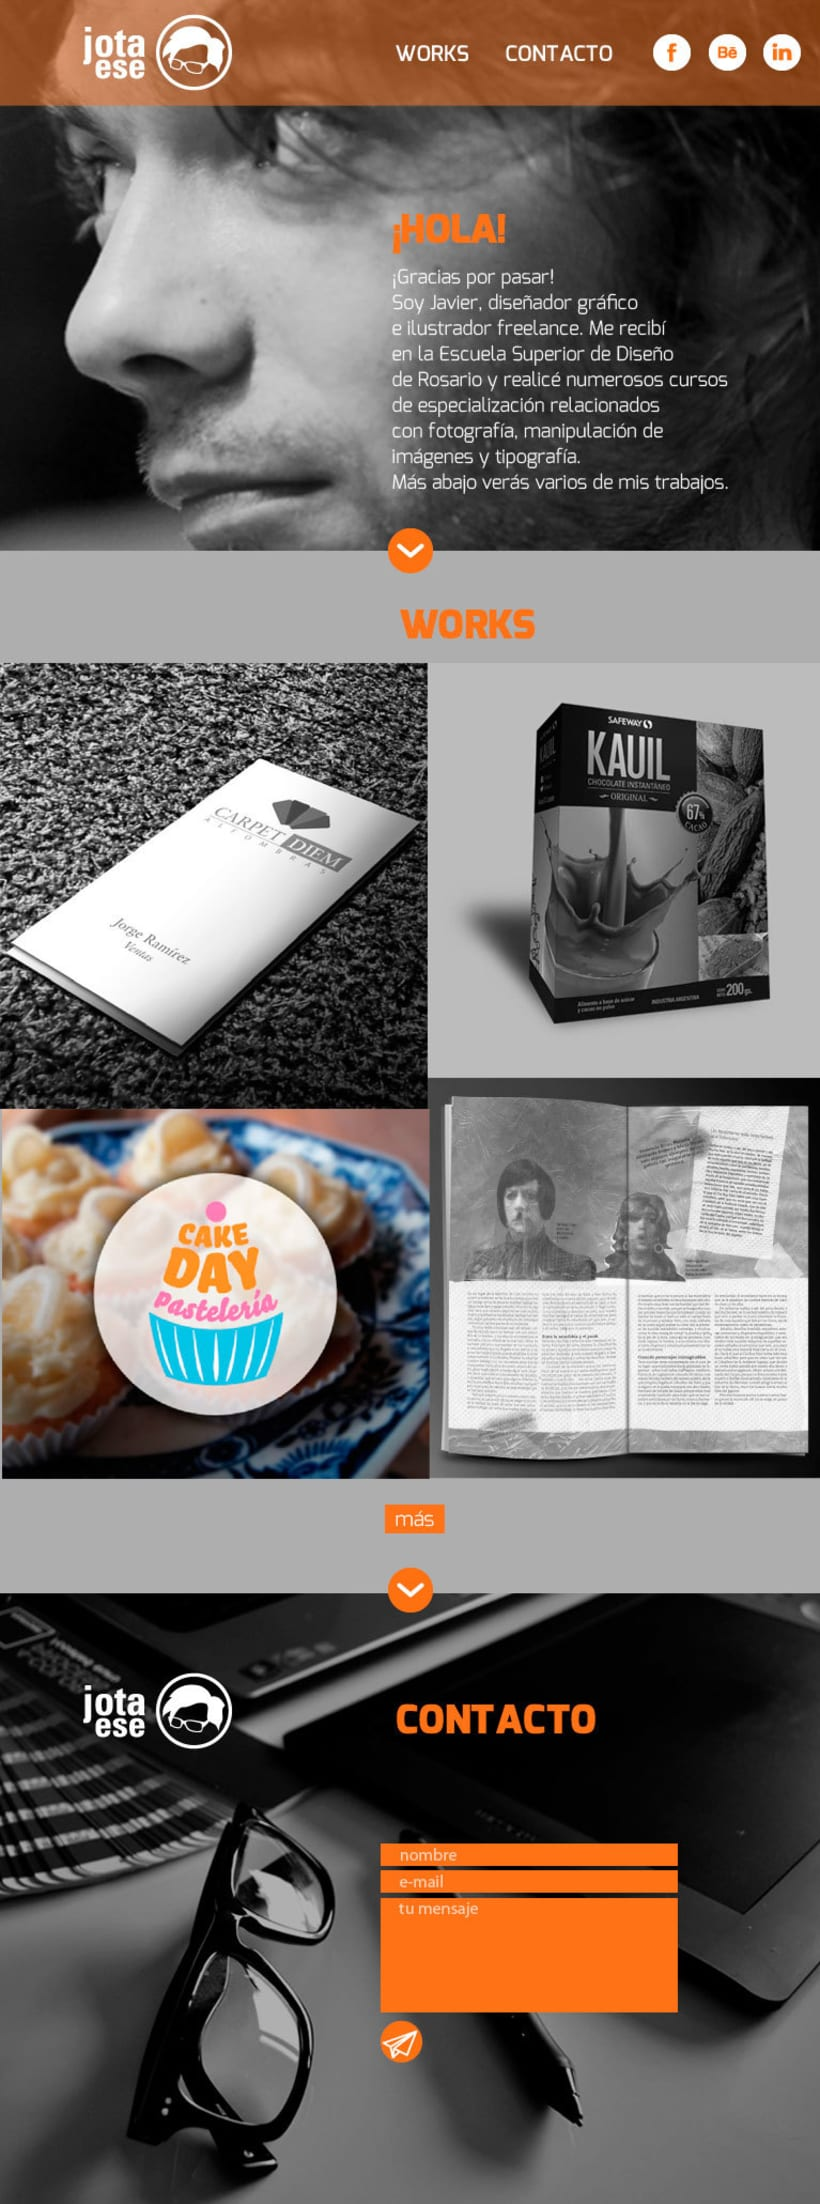 Diseño web responsive - Portfolio 4